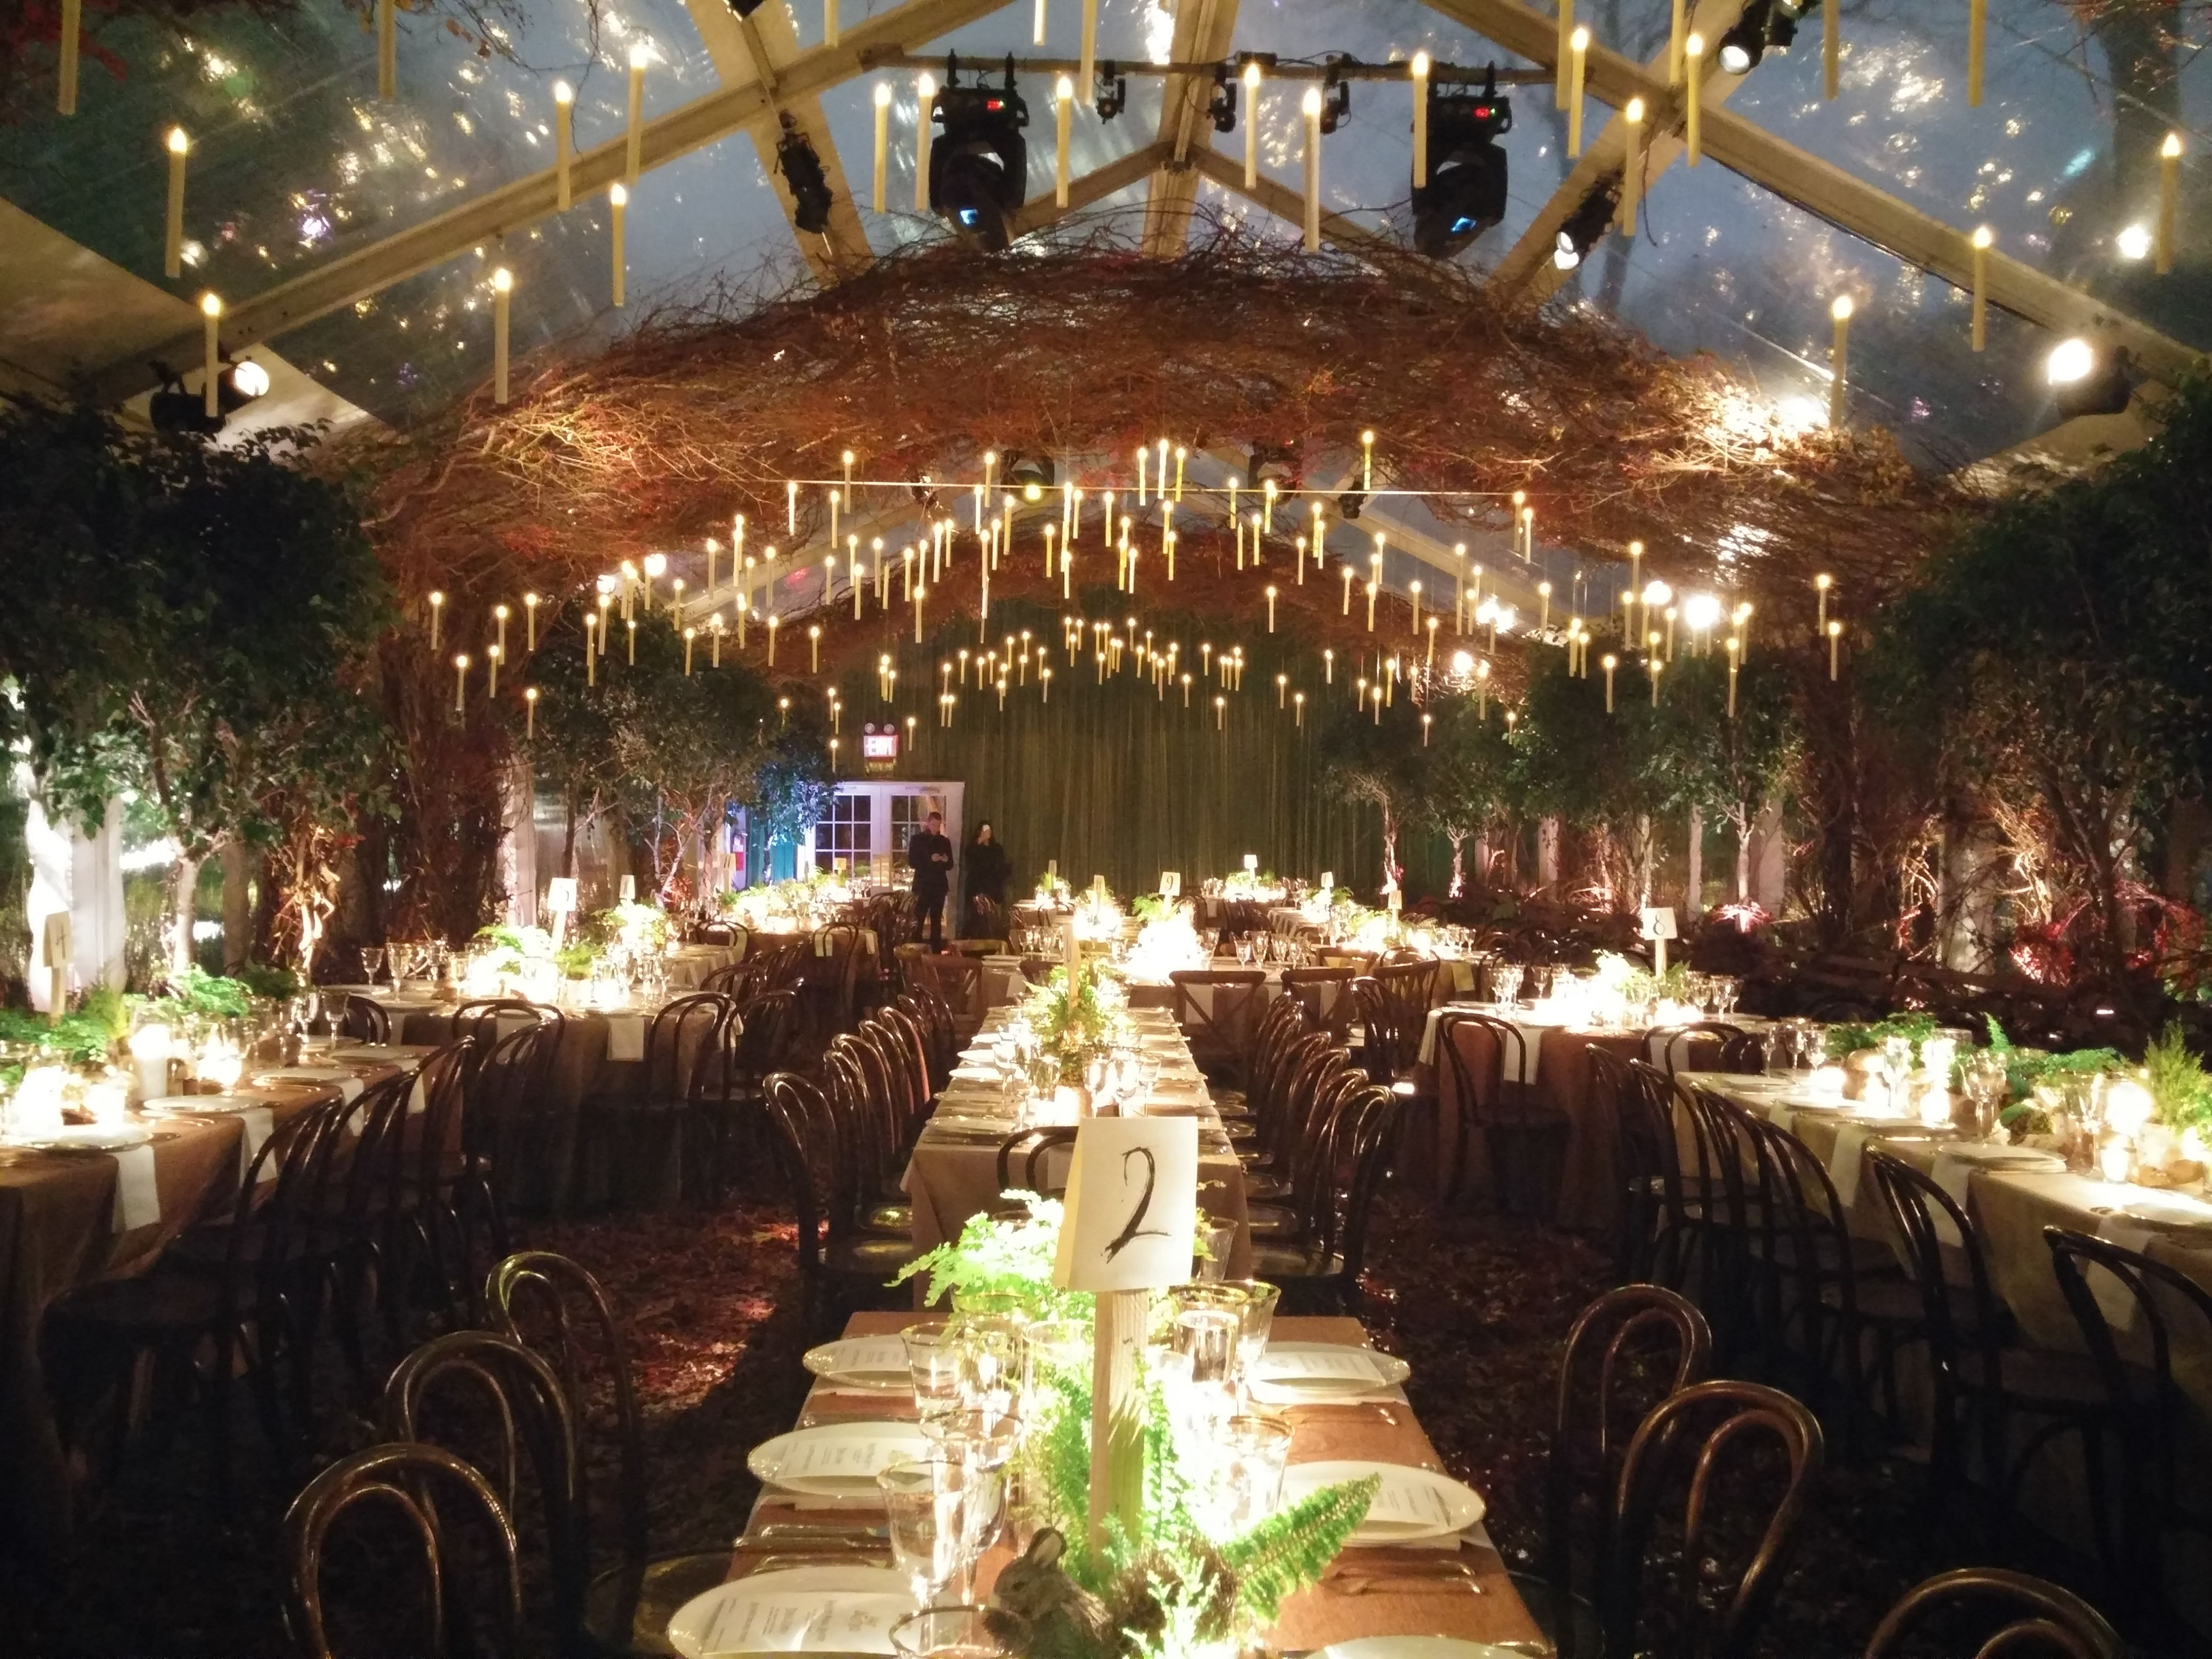 Central Park Zoo Seated Dinner Wedding Rehearsal Dinner Wedding